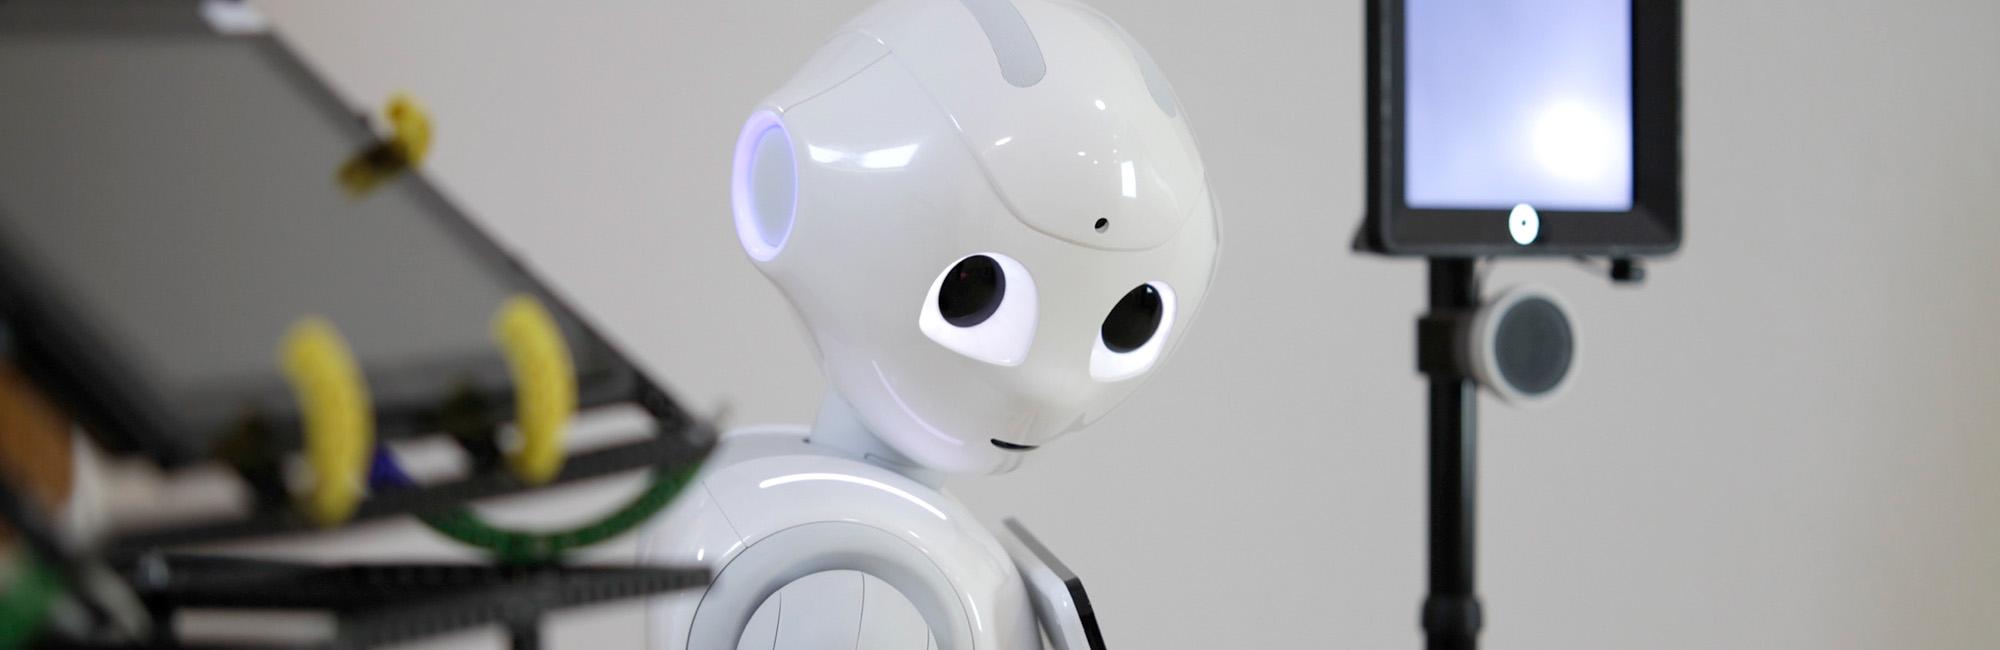 "Projektseminar   – Roboter ""Thea"" sucht den Weg"